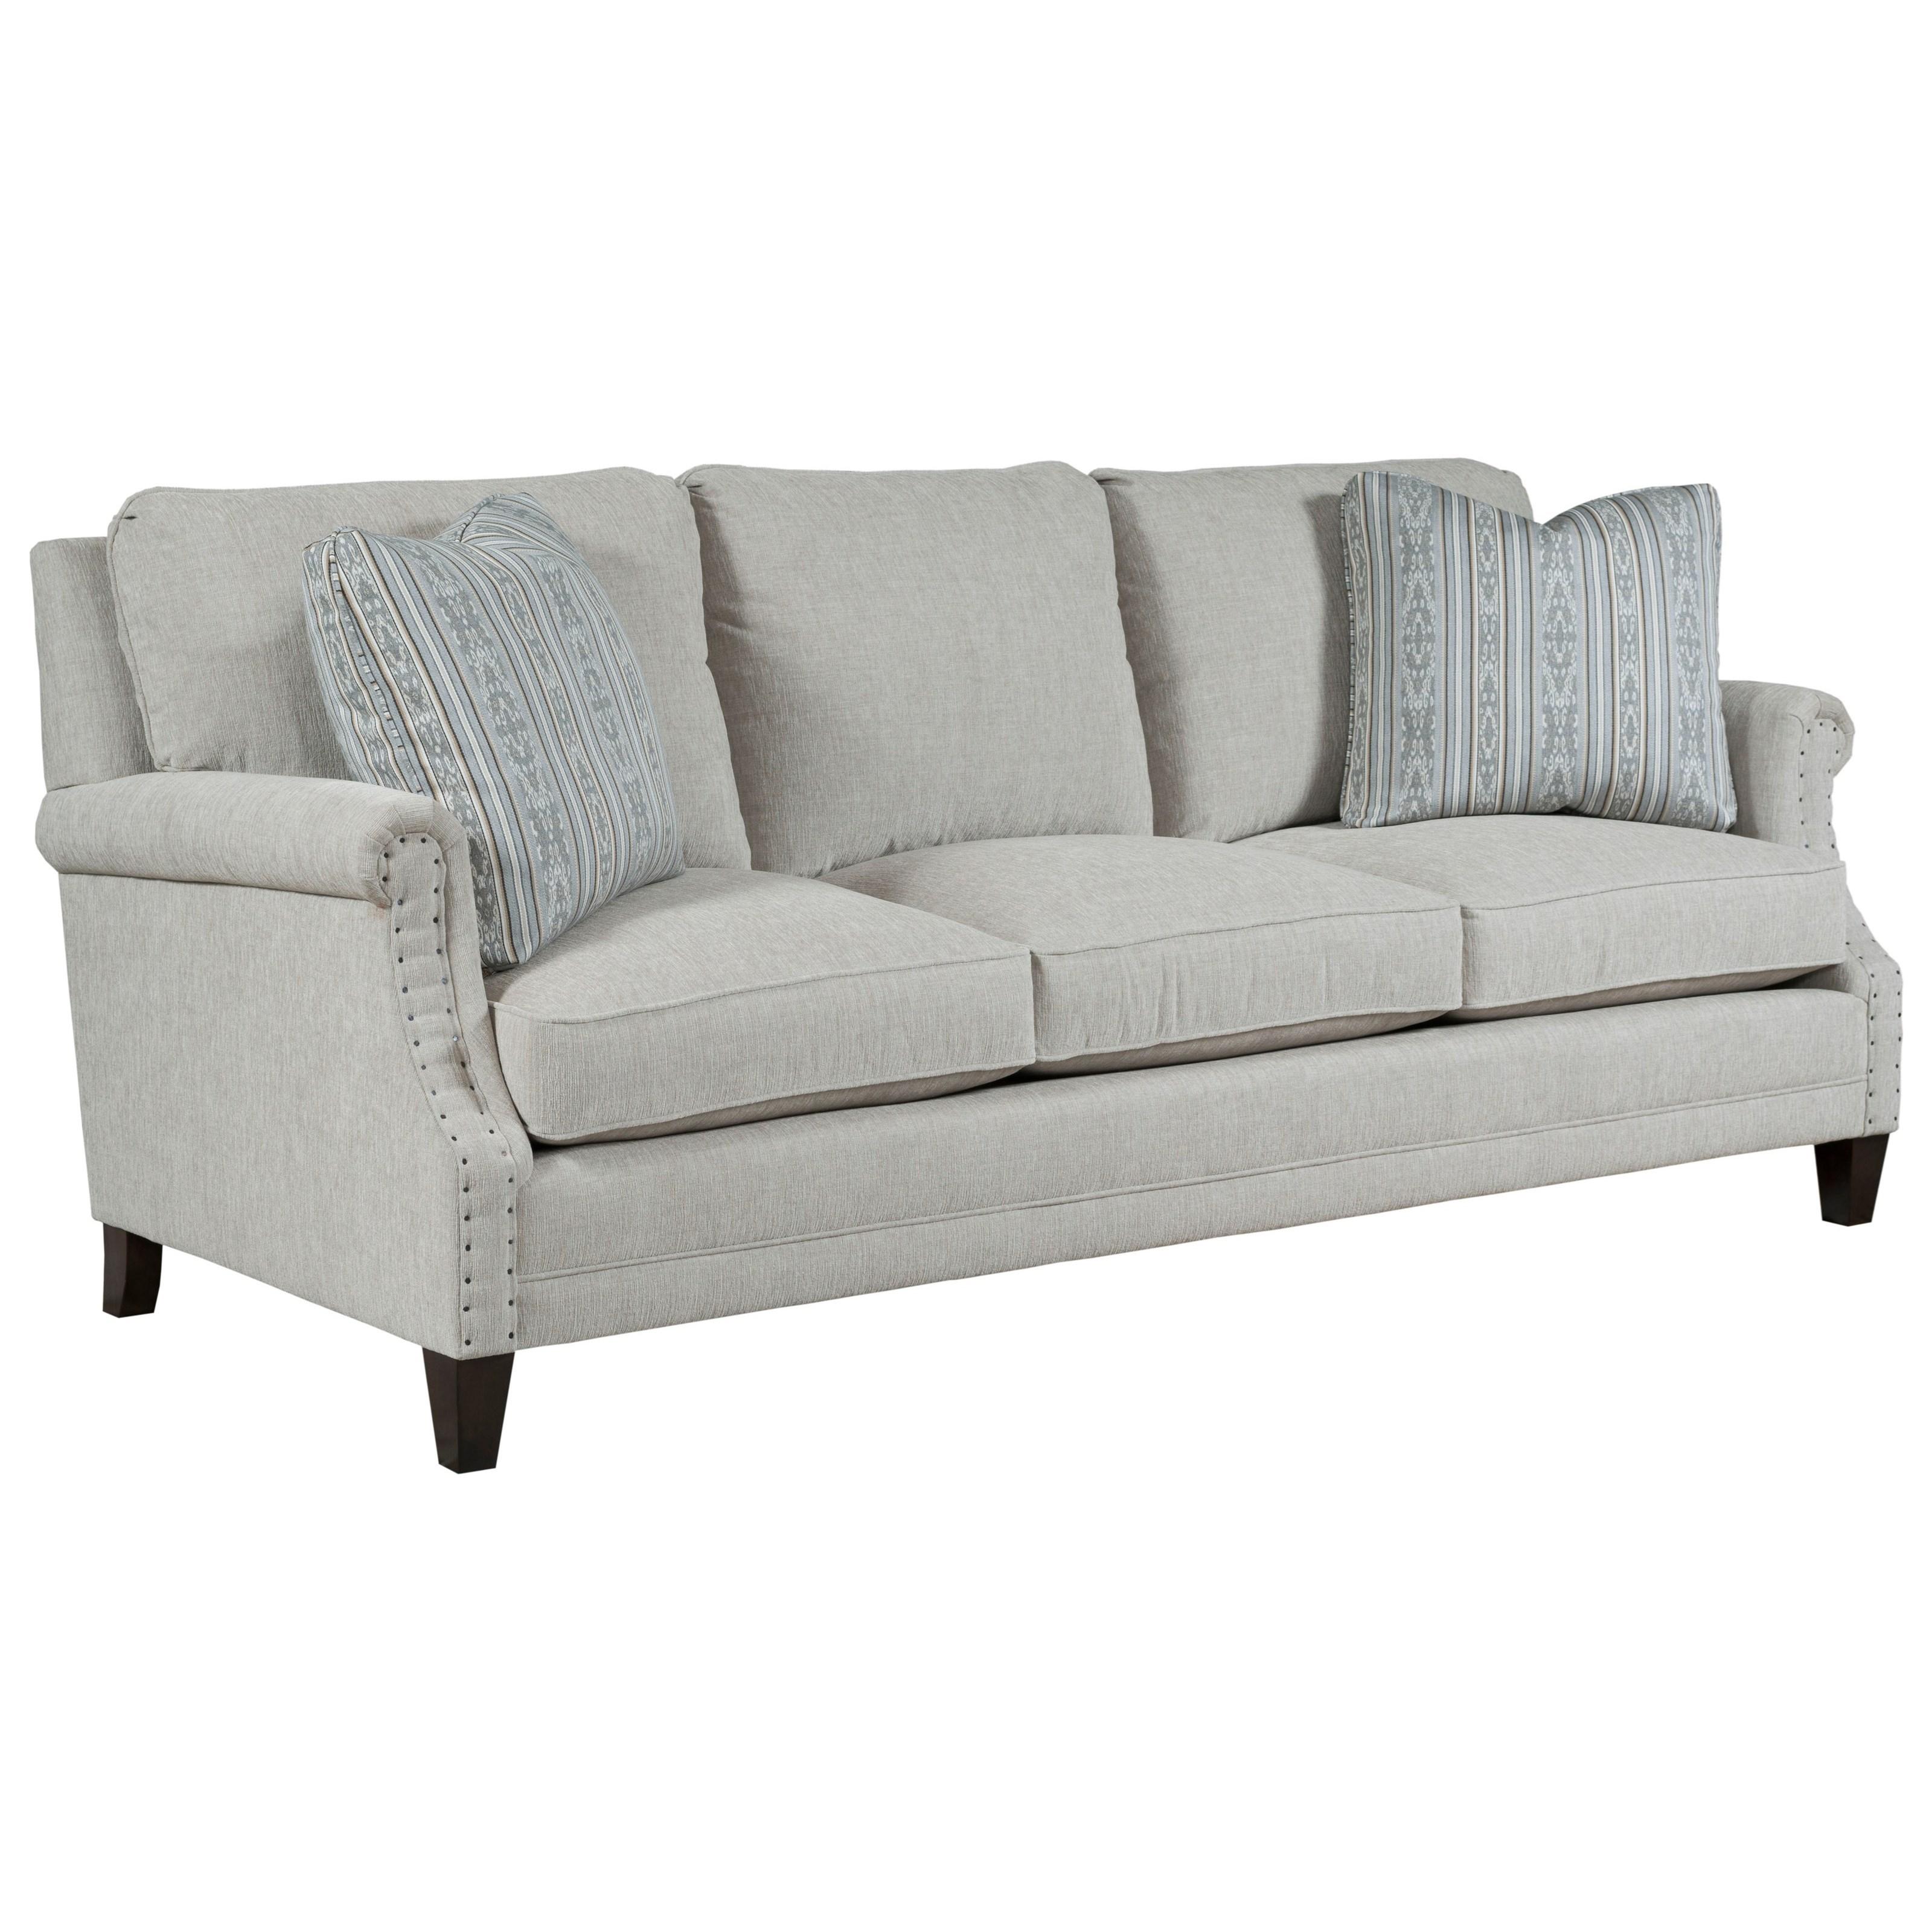 kincaid sofas reviews next sofia sofa furniture patterson 309 86 transitional three seat